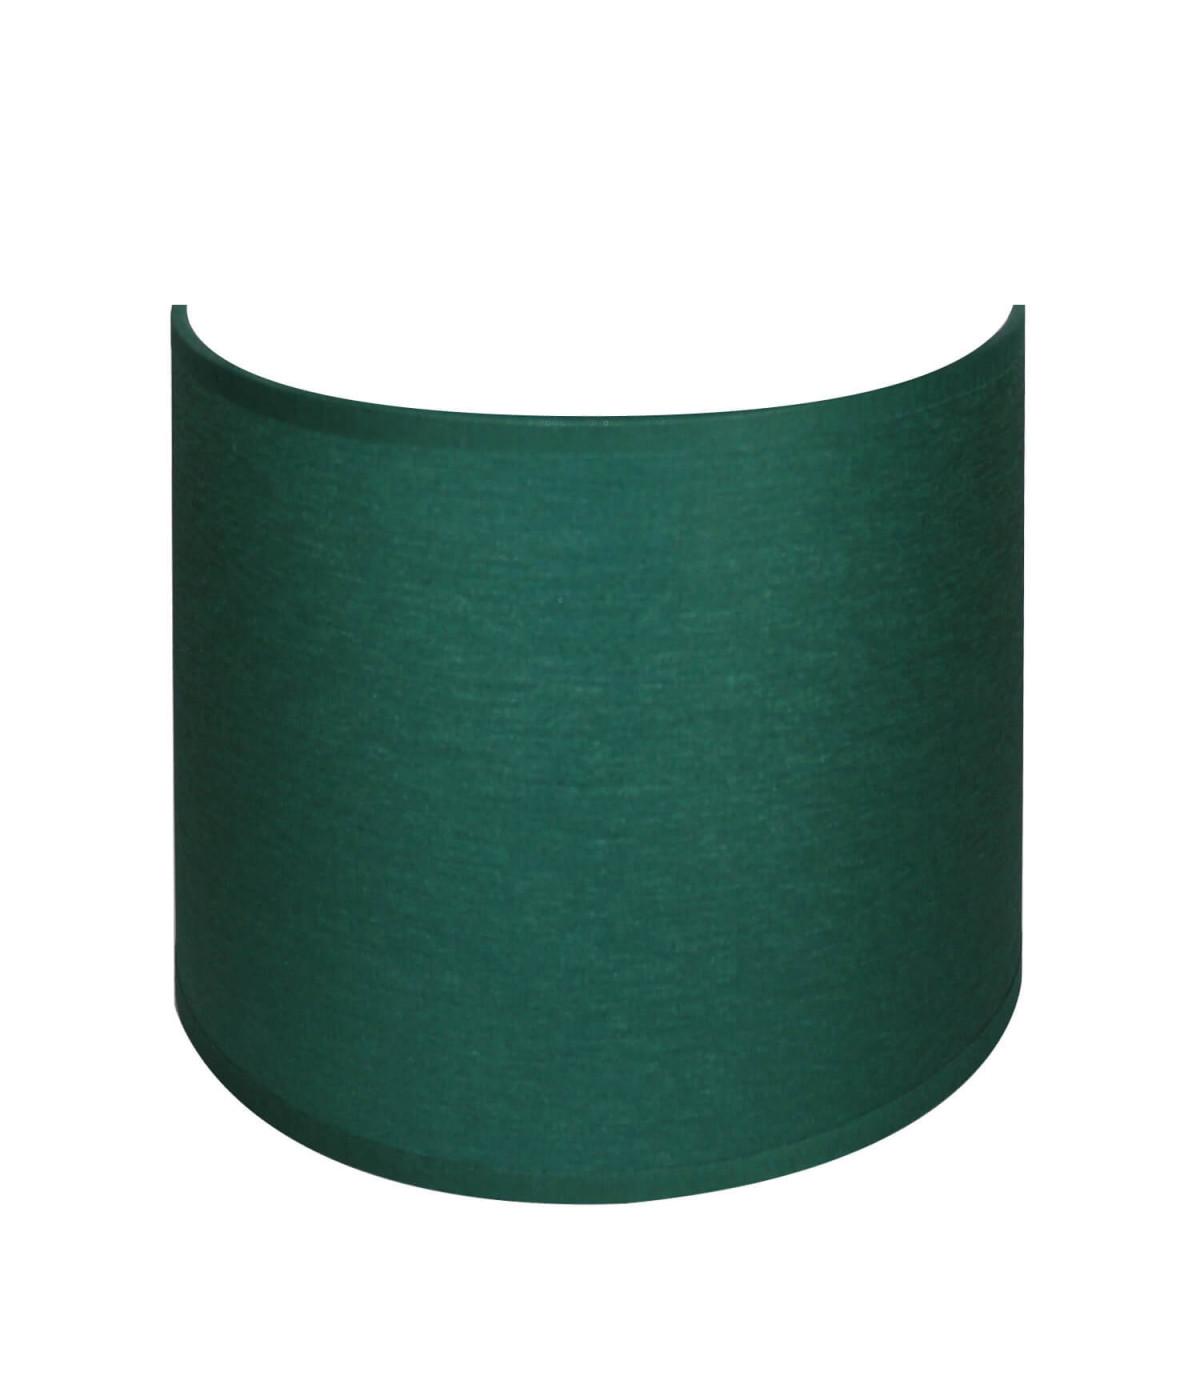 applique ronde vert empire